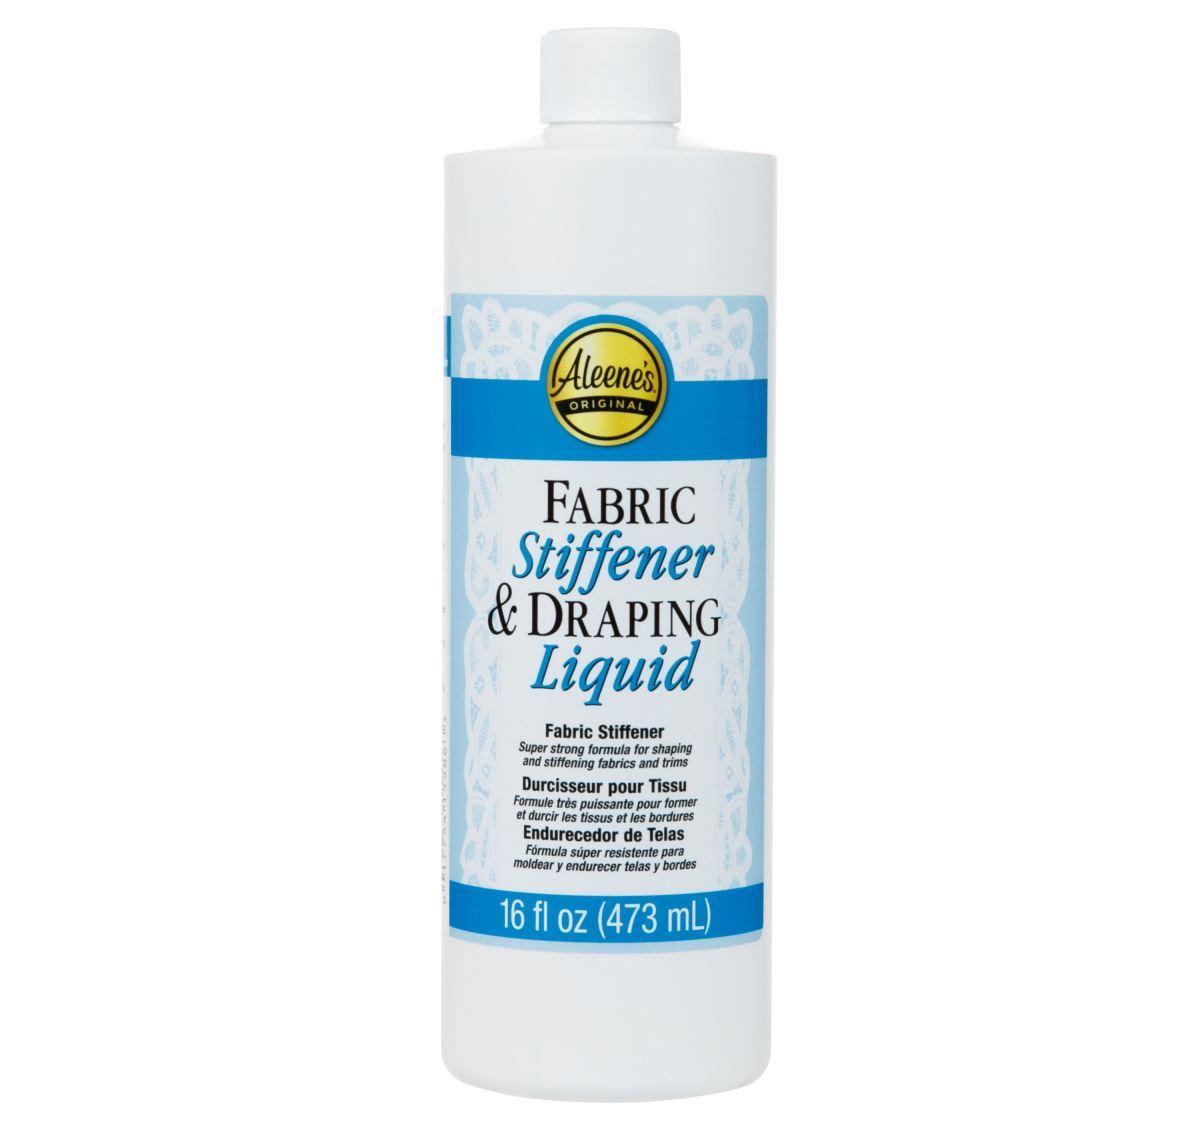 Aleene's ® Fabric Stiffener & Draping Liquid 16 oz